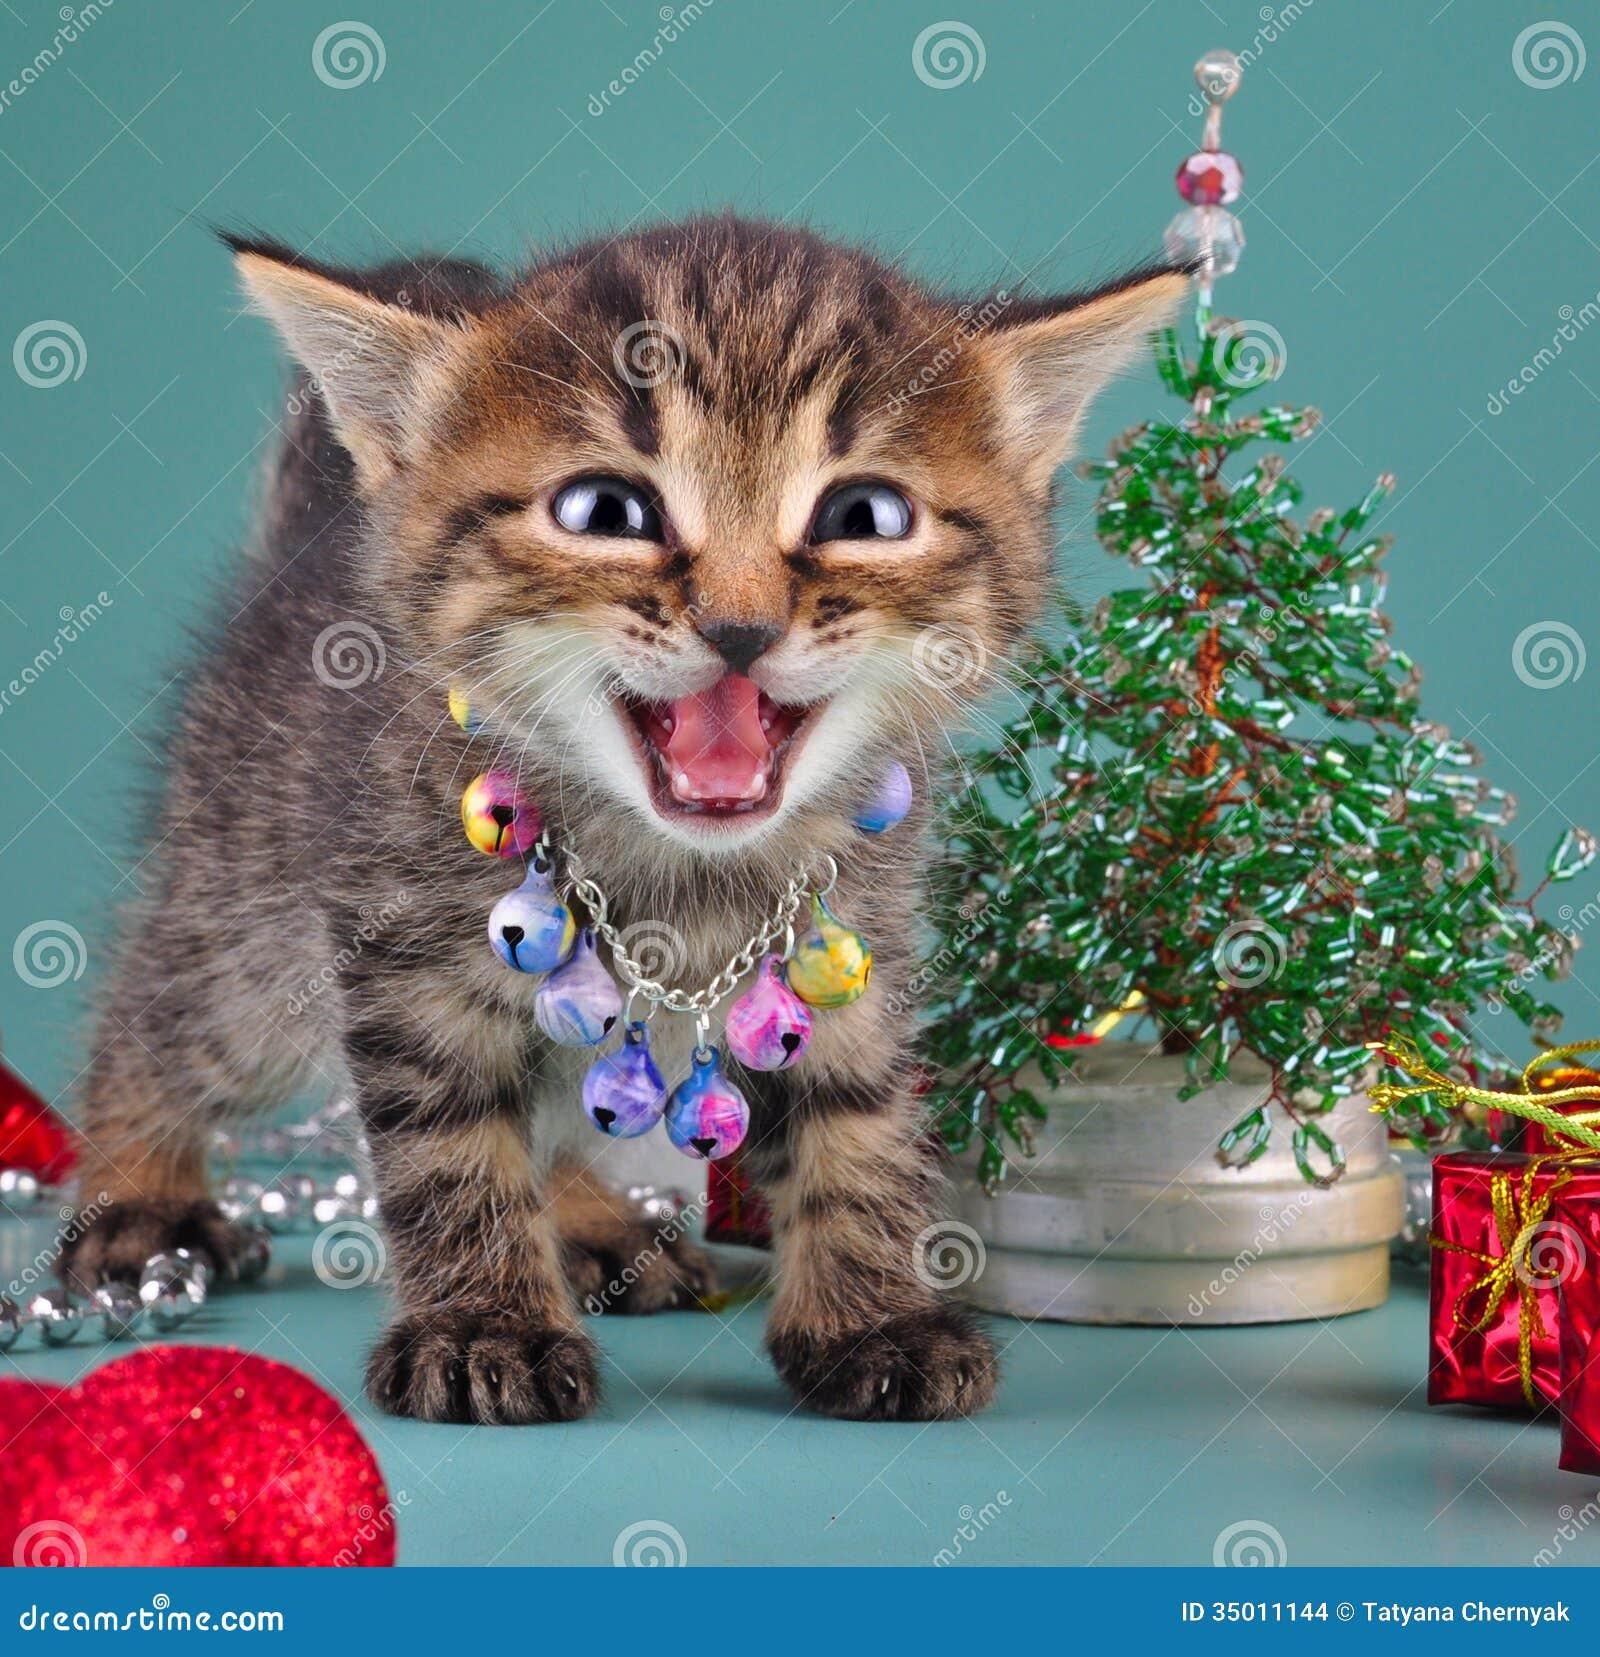 Small kitten among Christmas stuff Stock Images